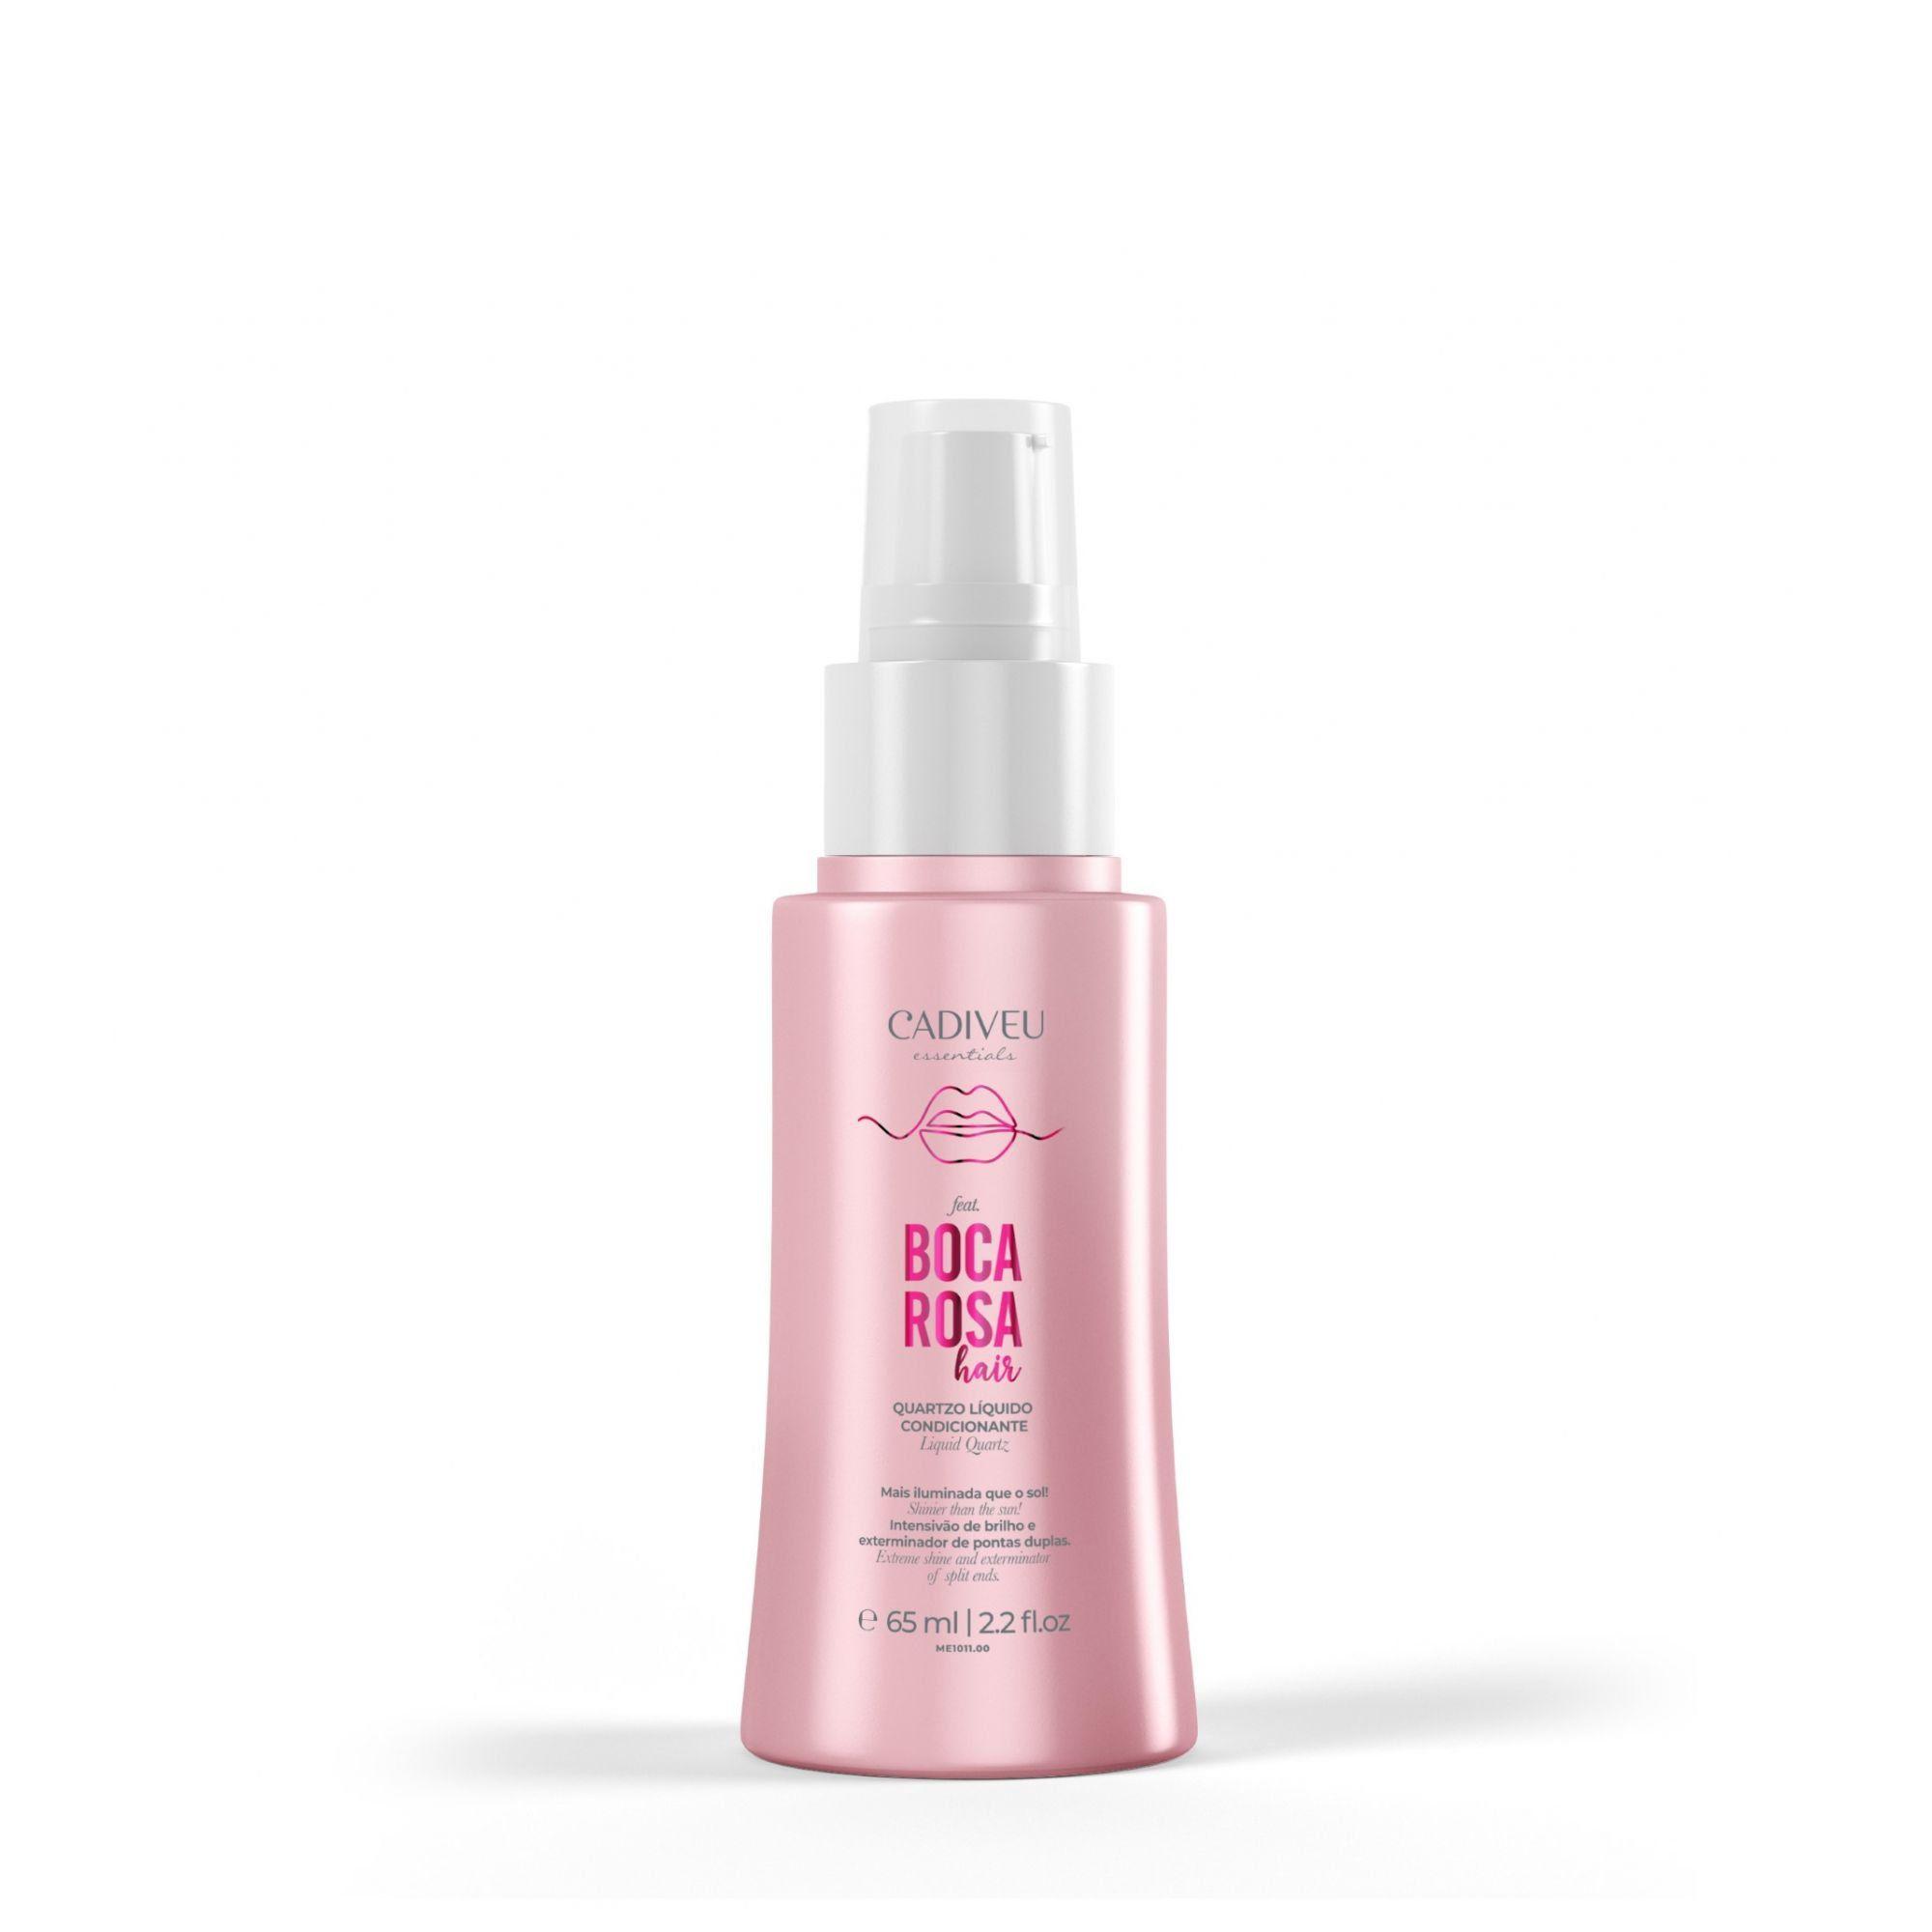 Serum Quartzo Líquido Condicionante 65ml Boca Rosa Hair - Cadiveu Essentials